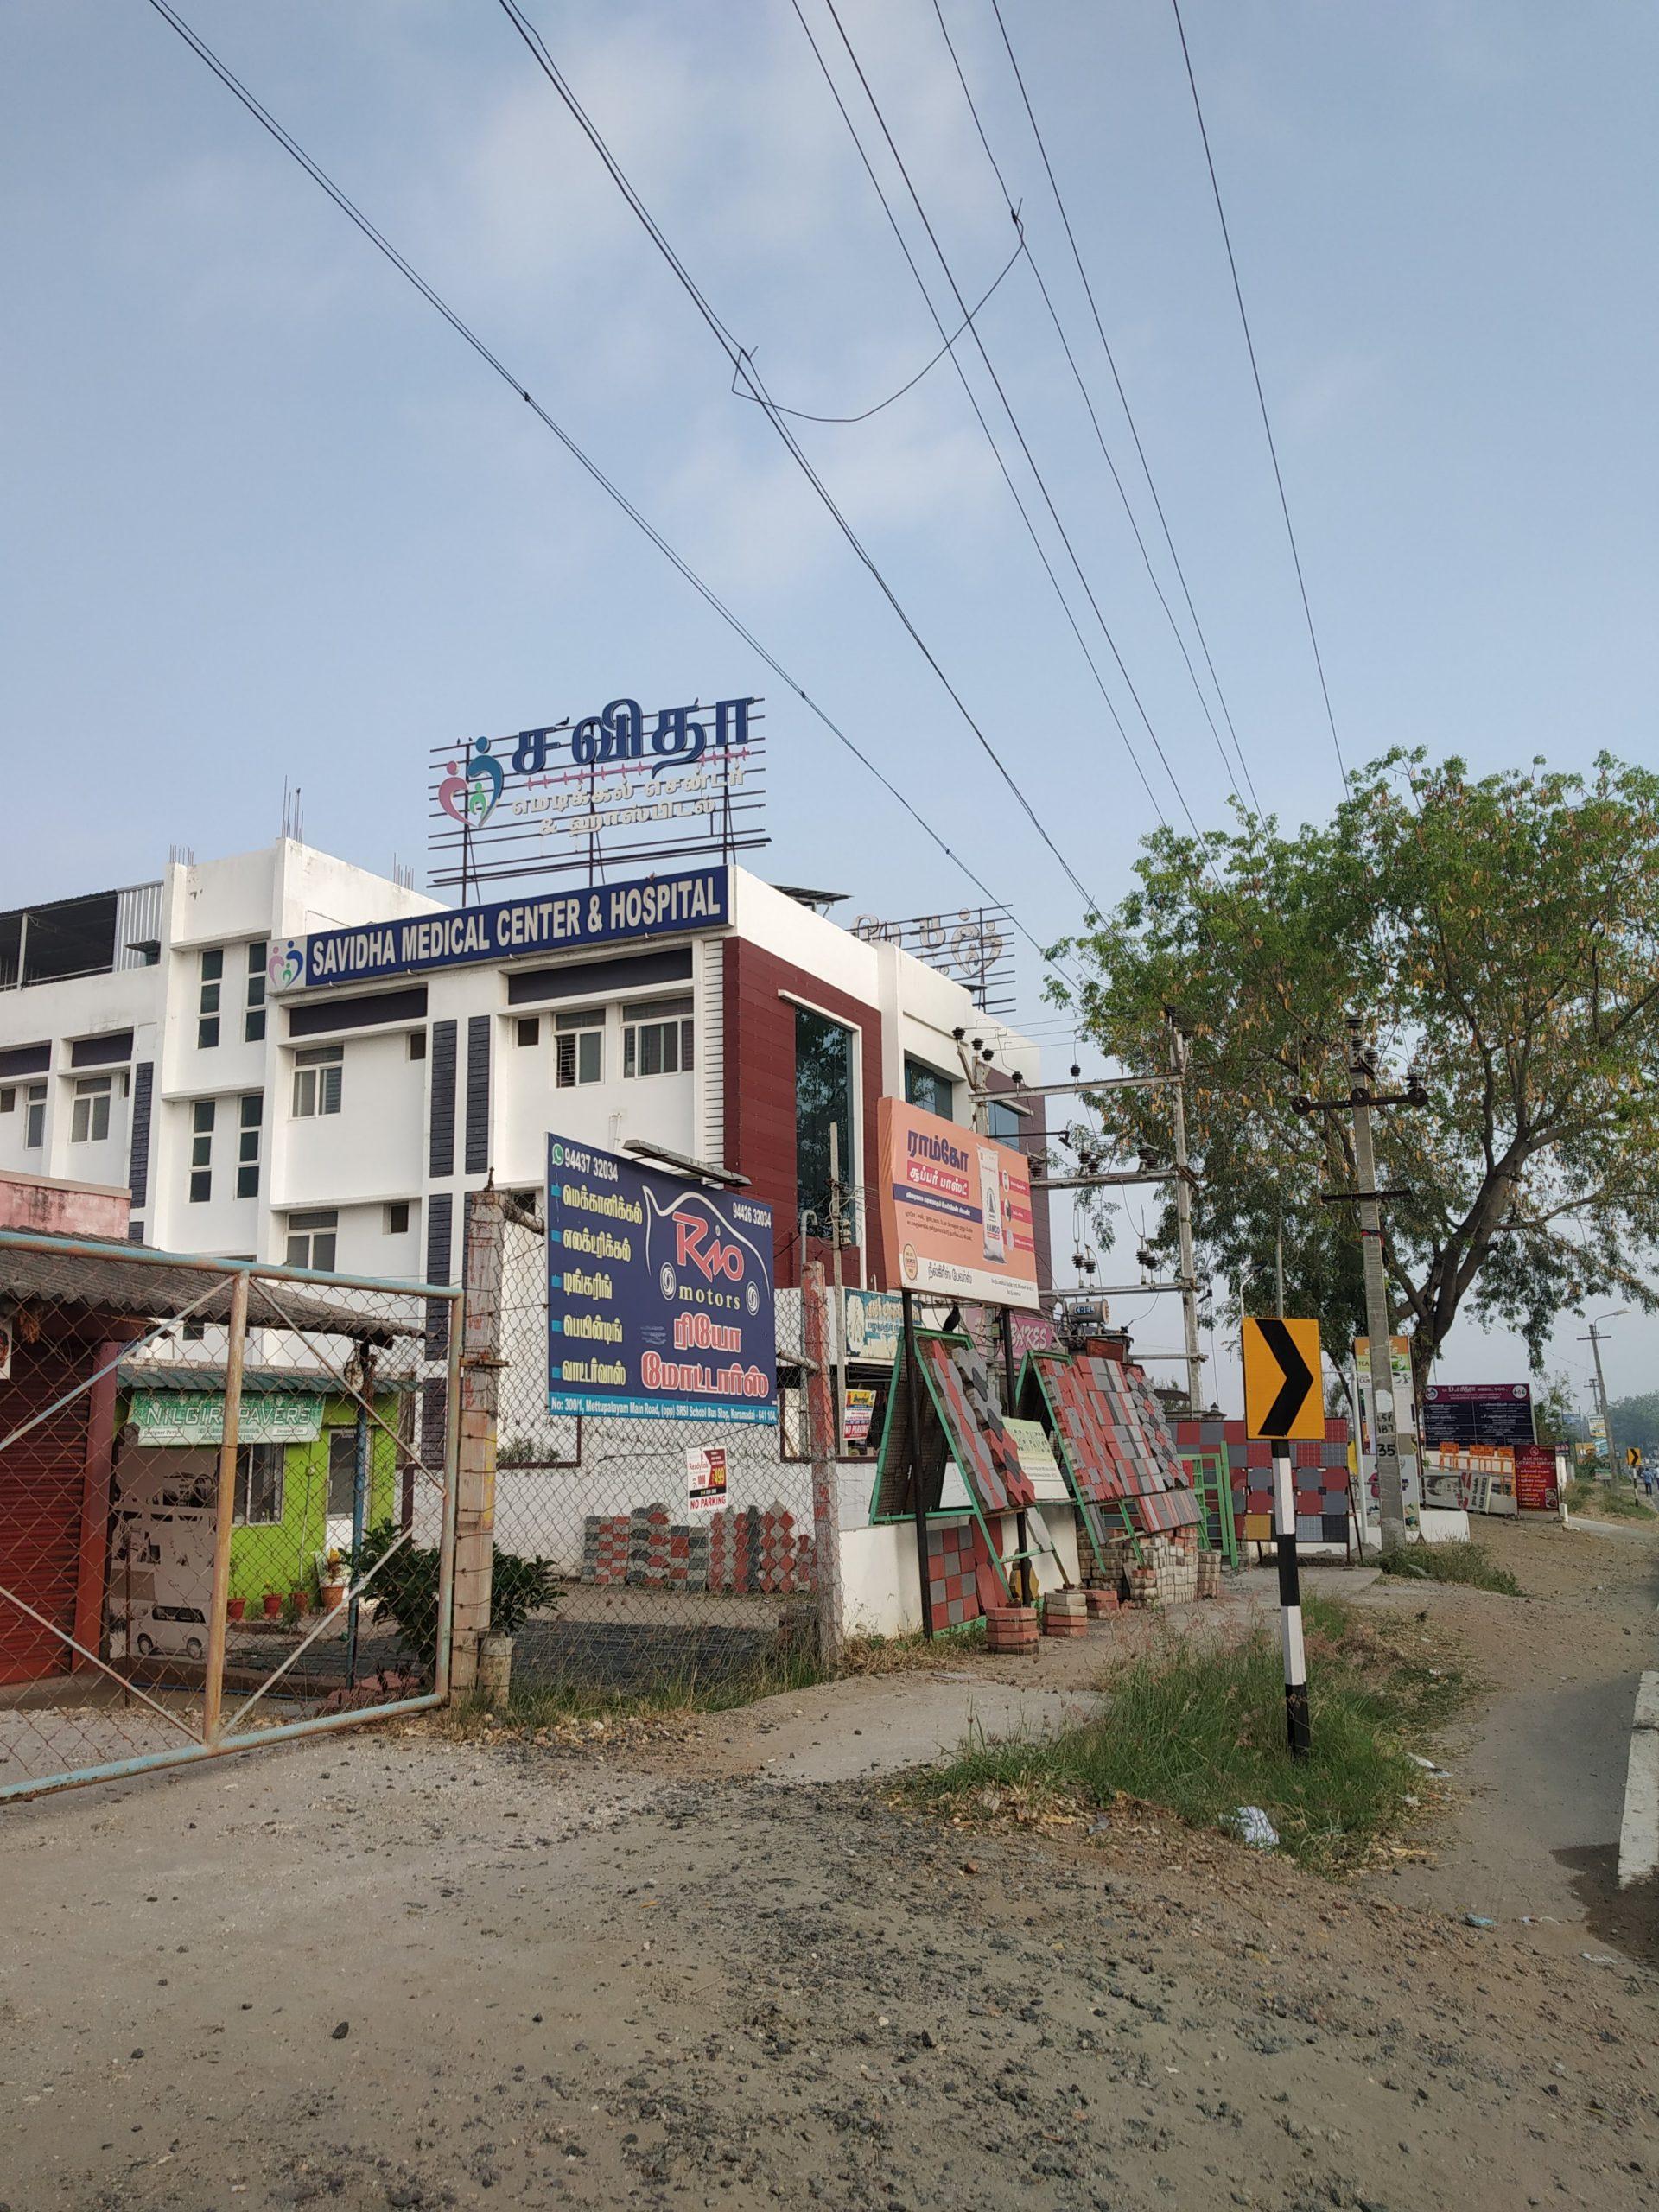 Hospital roadside